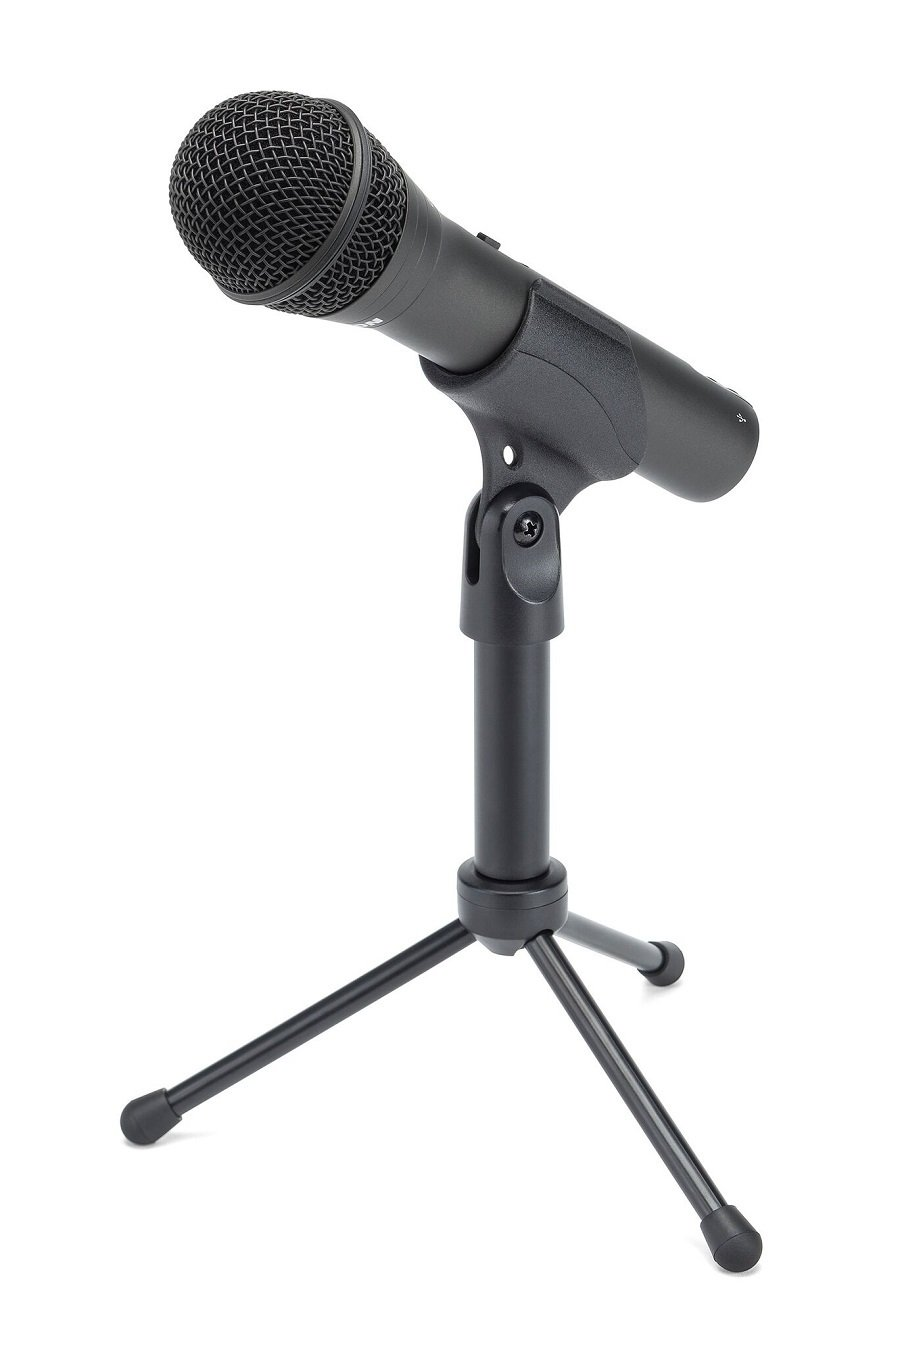 samson q2u handheld dynamic usb microphone recording and podcasting pack techadict